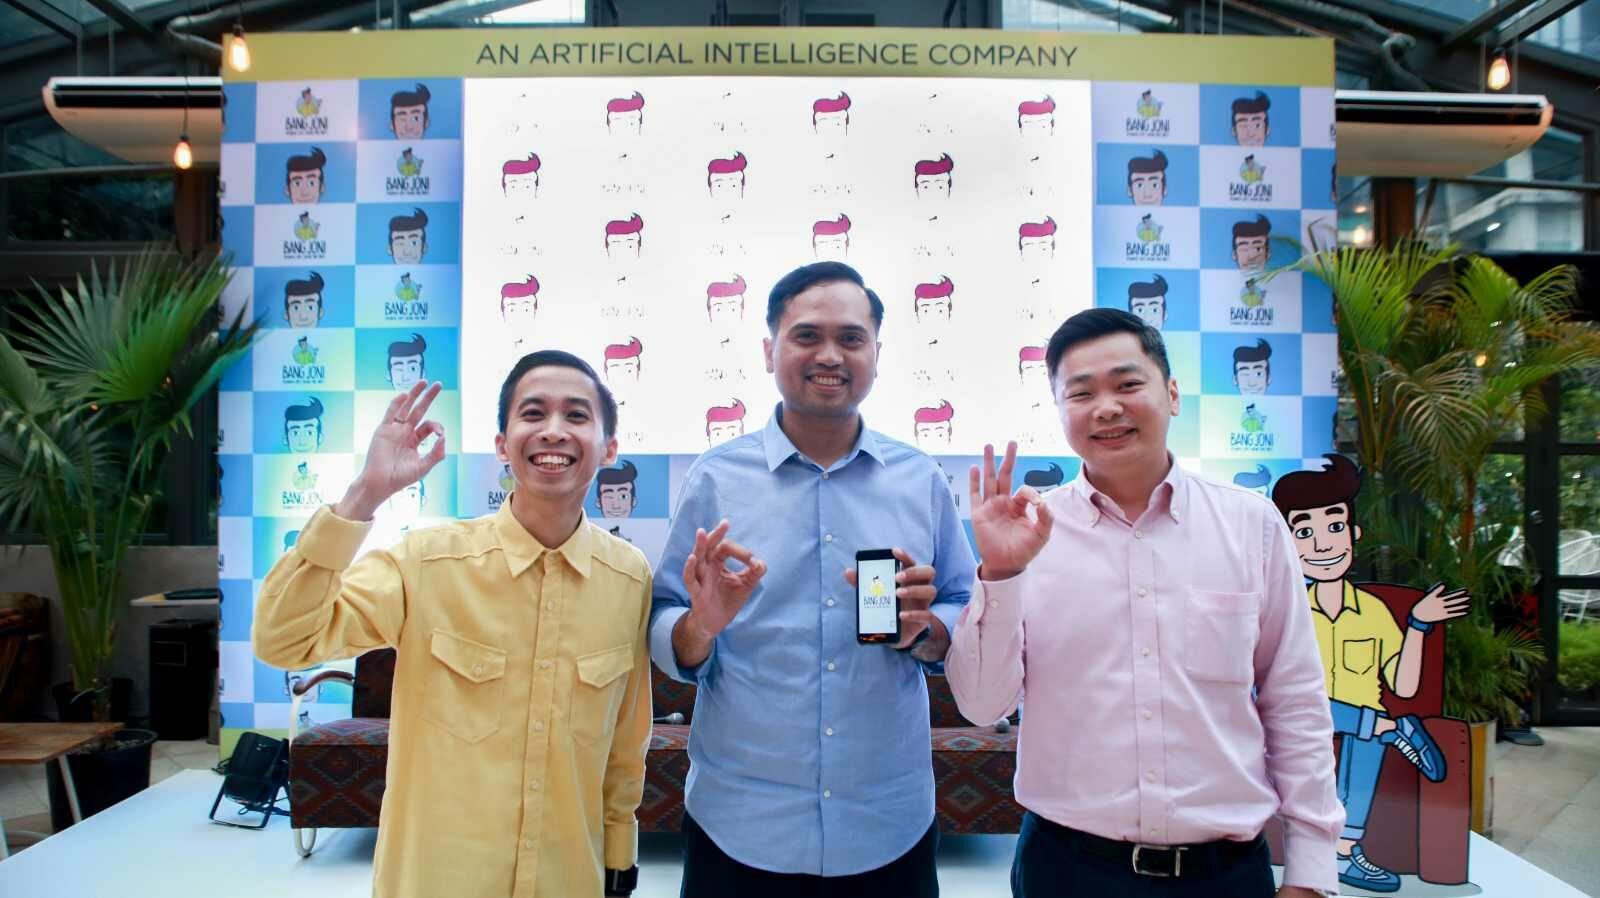 Arra Primanta Cmo Bang Jonidiatce Harahap Ceo Bang Joni Yulianto Balawan Senior Marketing Managerskyscannerrz